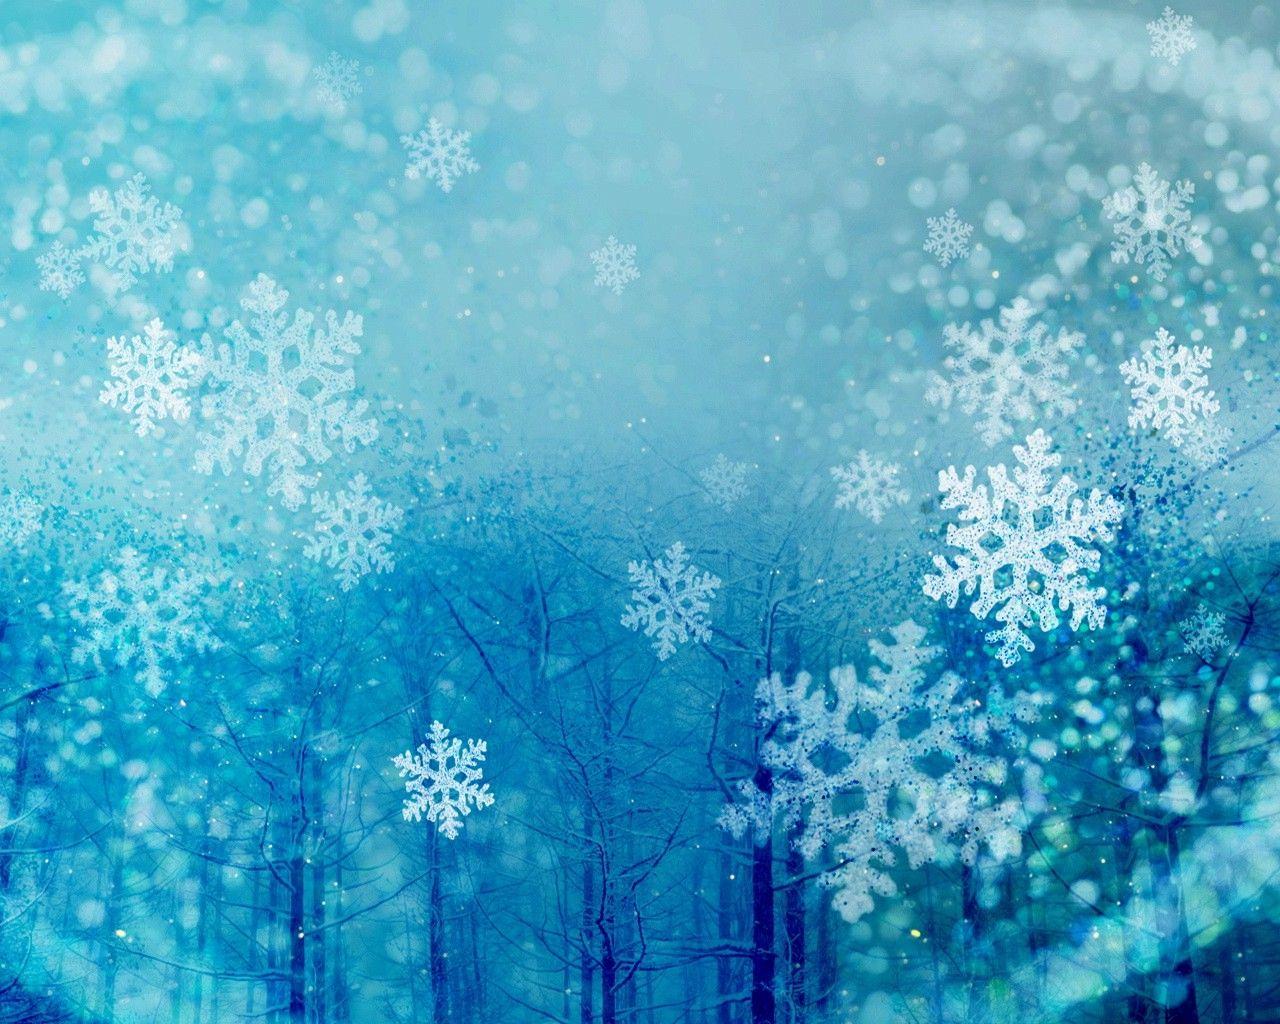 Красивые обои со снежинками (25 шт): www.bugaga.ru/wallpaper/1146736487-krasivye-oboi-so-snezhinkami.html